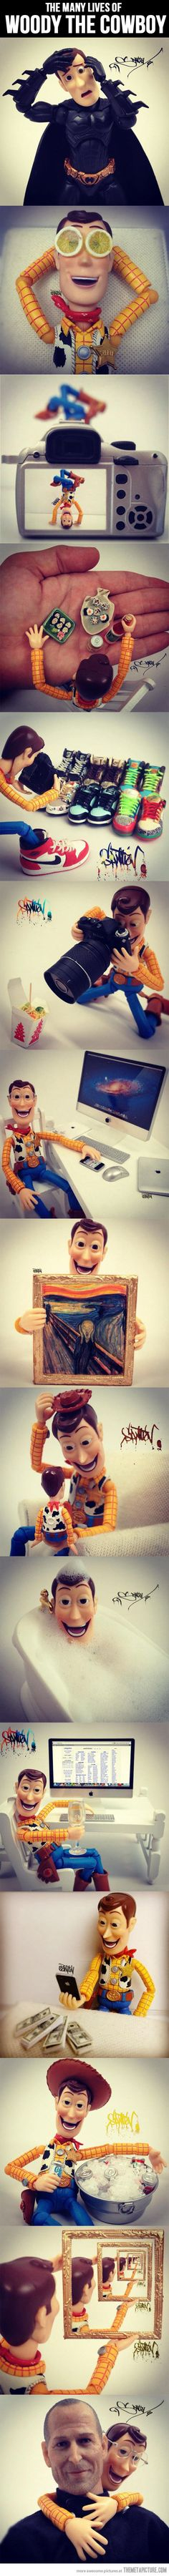 Woody's Secret Life…